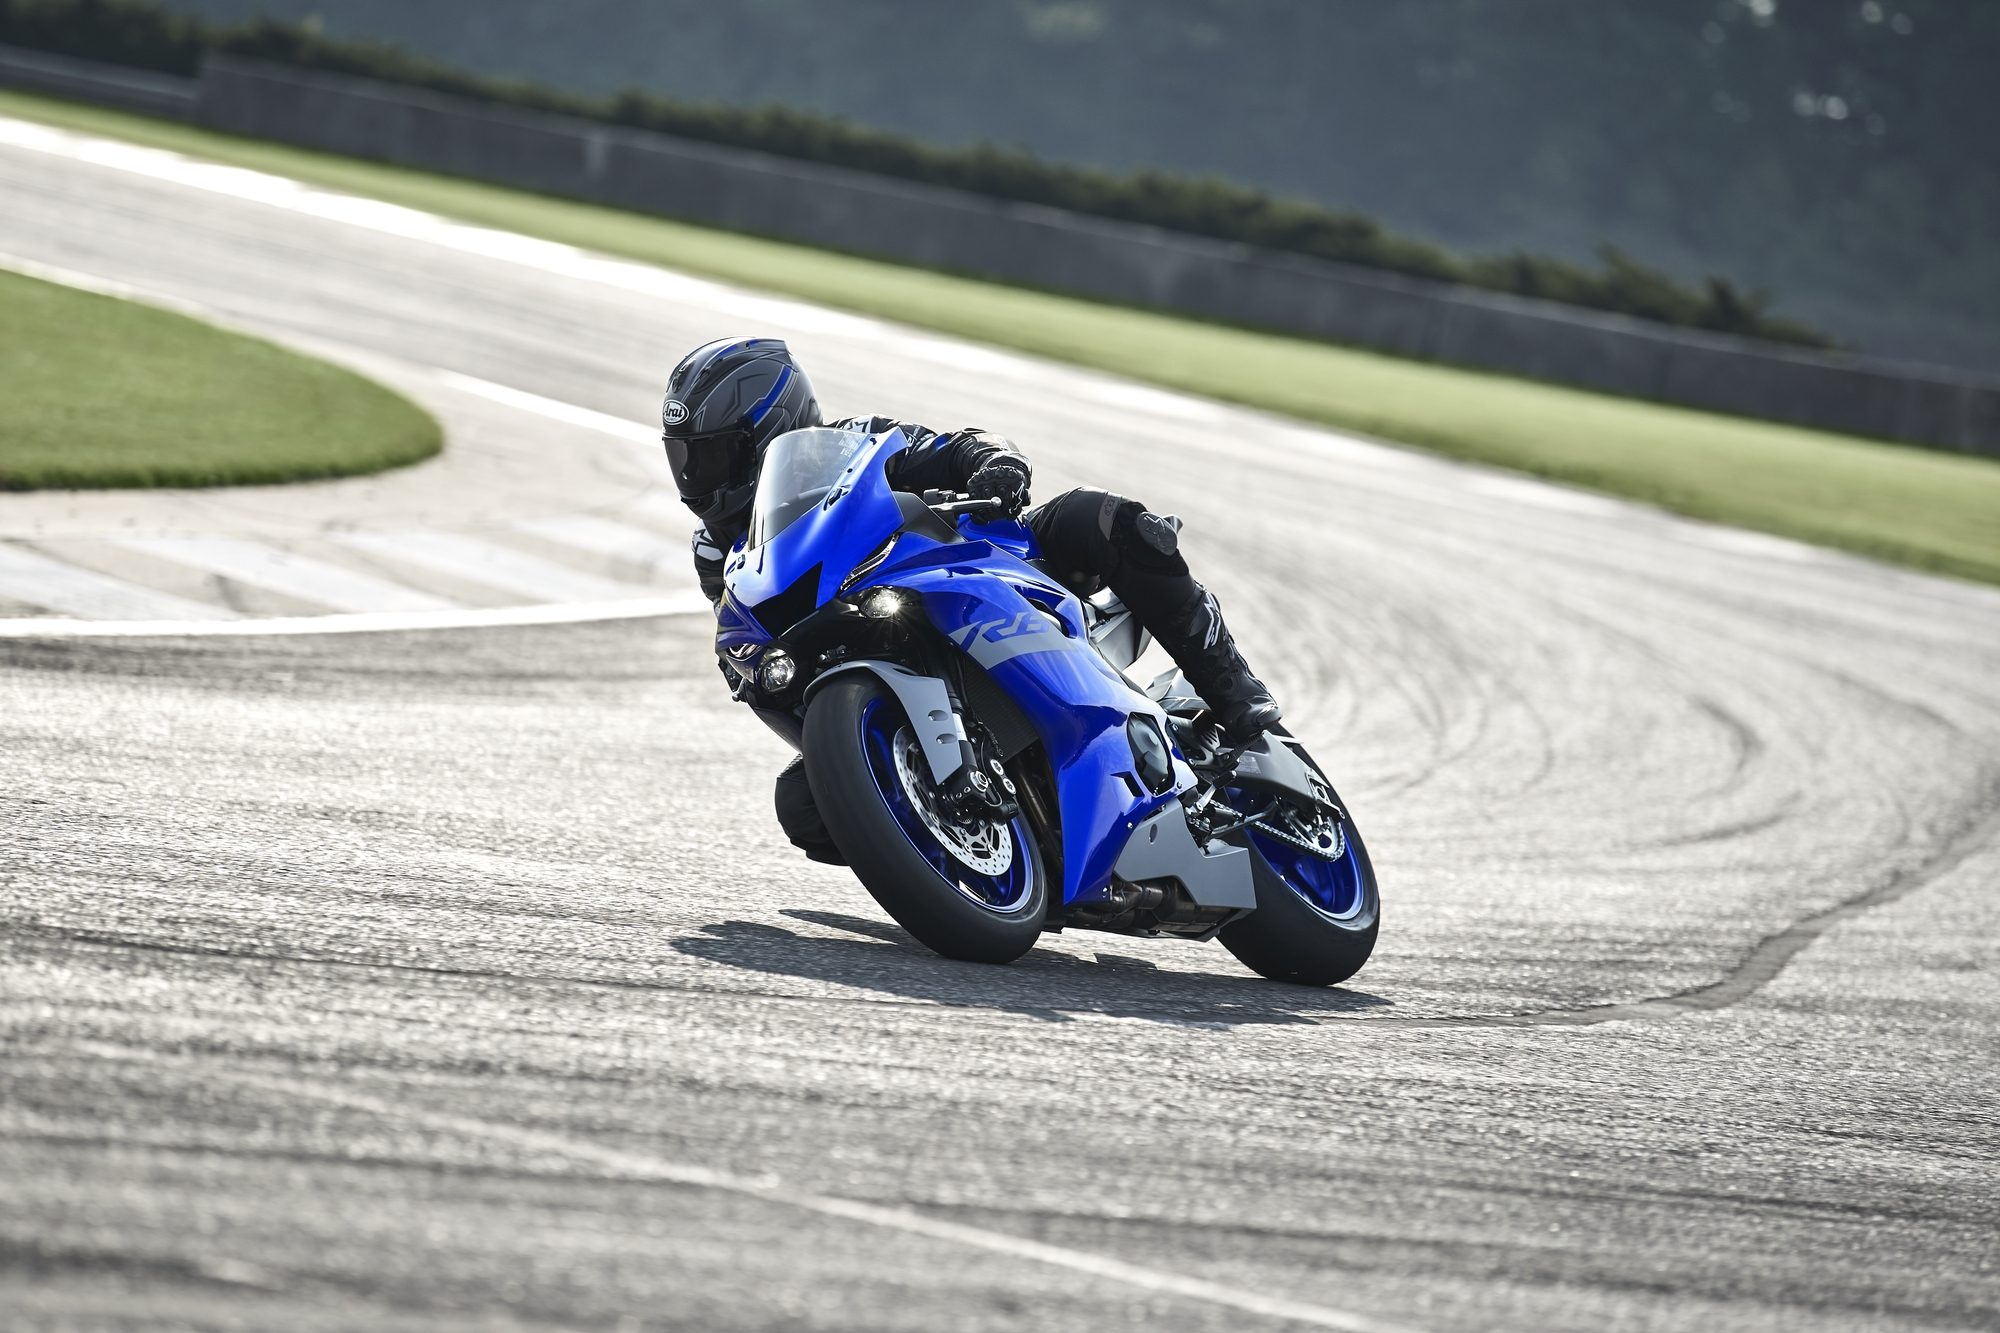 YZF-R6 - motorcycles - Yamaha Motor